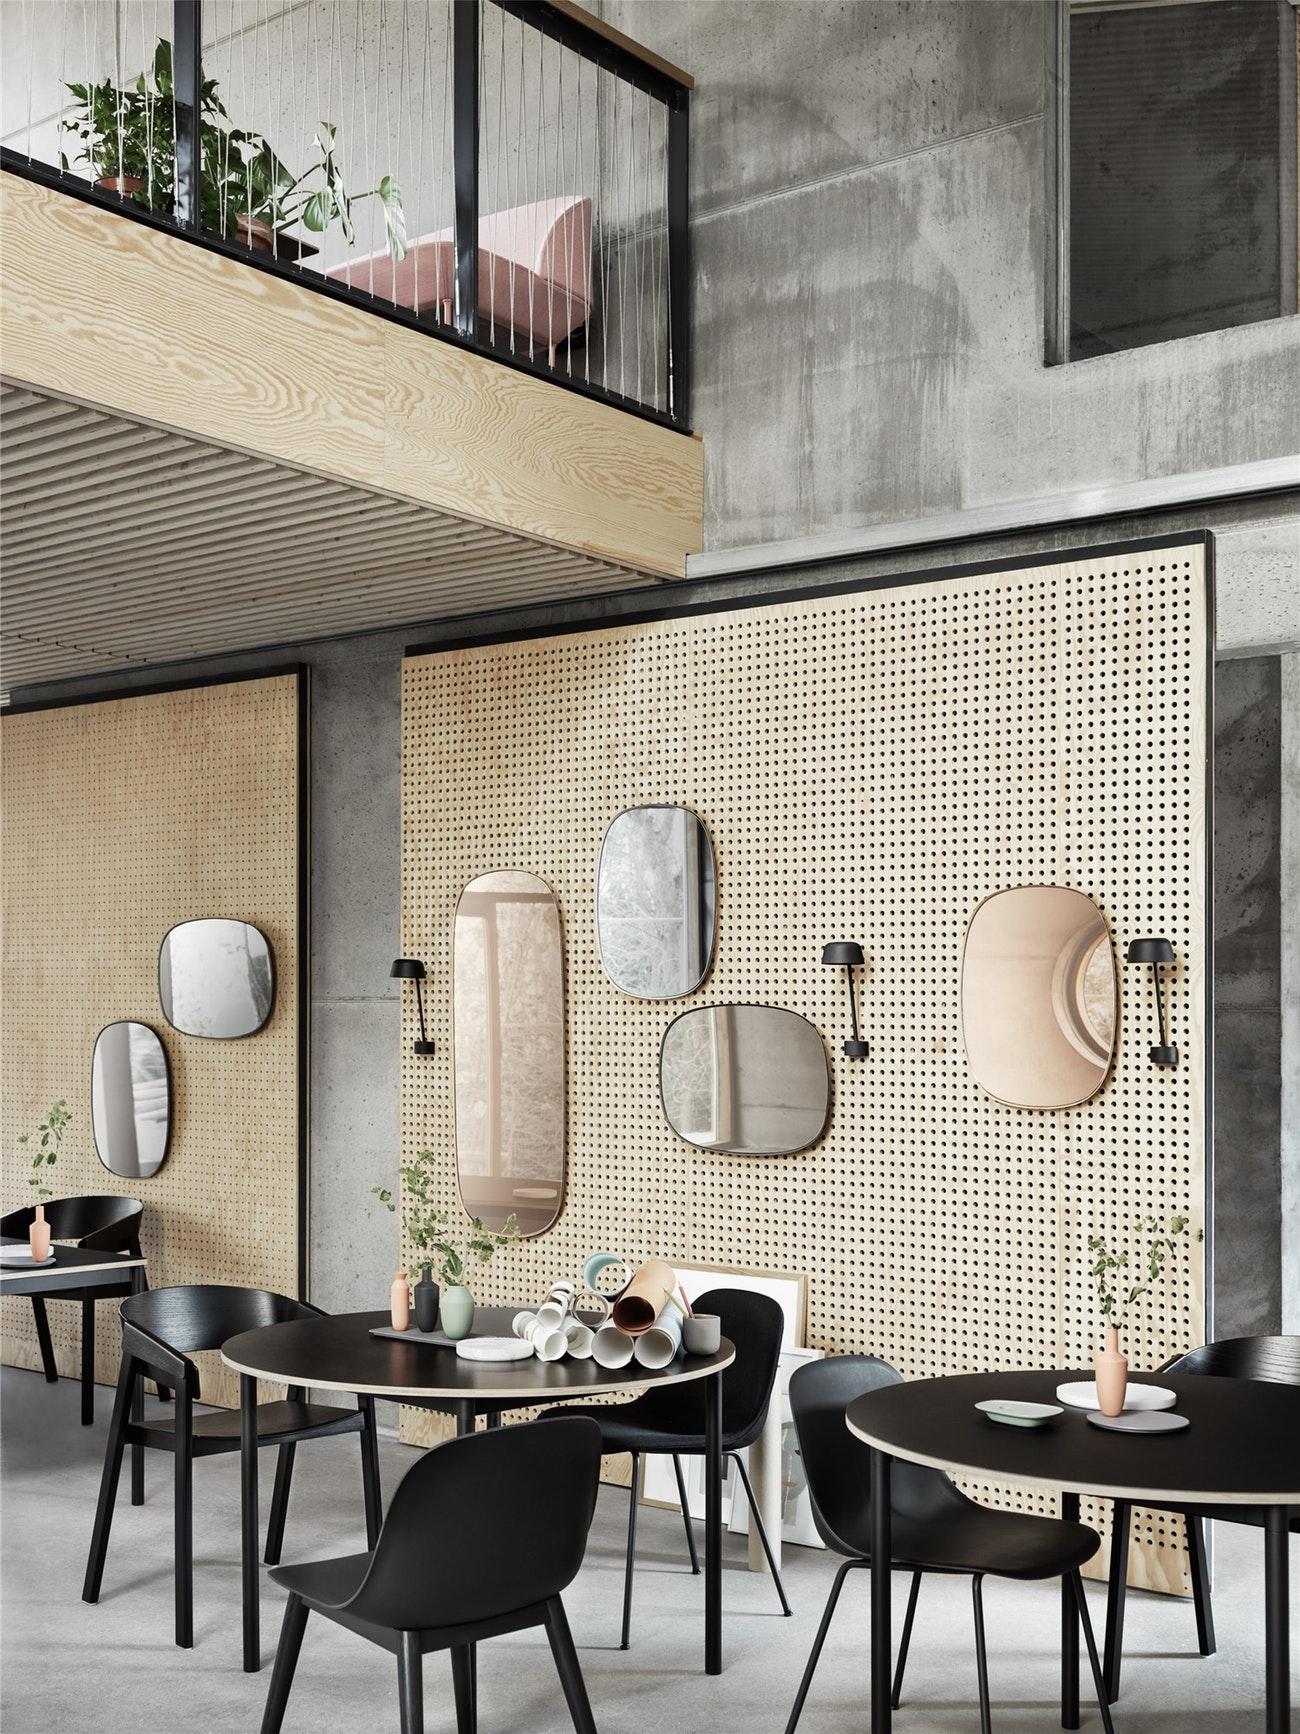 framed-mirrors-cafe-steeting-lean-o110-base-table-med-res-1460122824.jpg